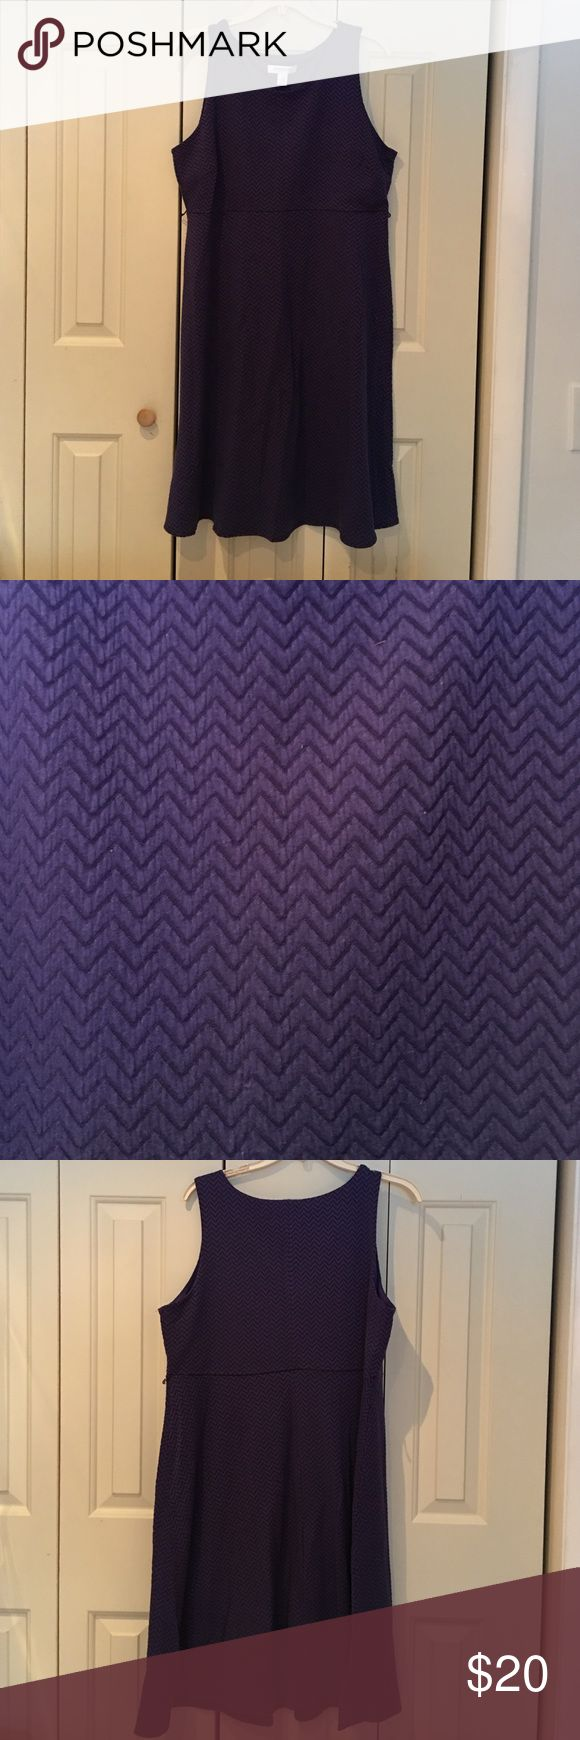 Best 25+ Purple maternity dresses ideas on Pinterest | Maternity ...